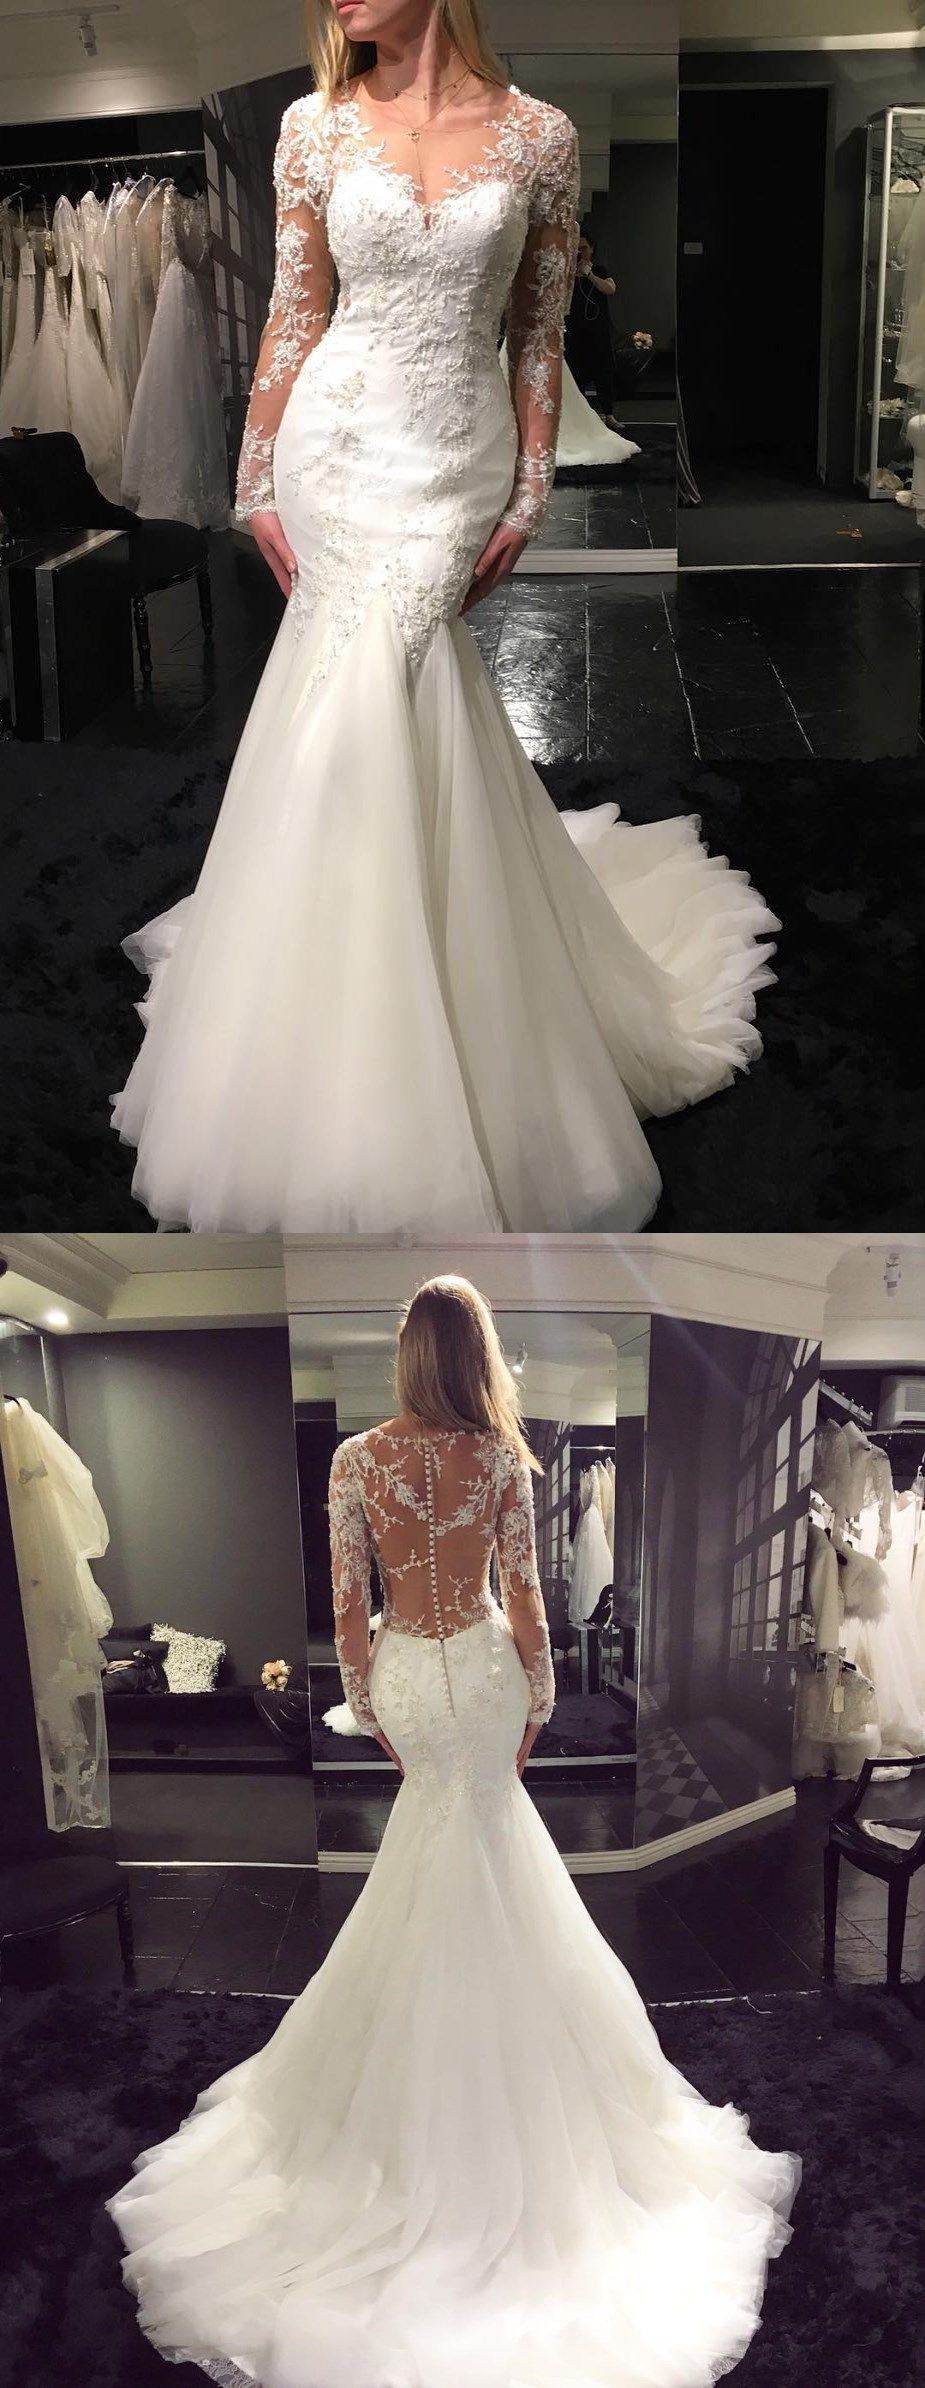 Long sleeve wedding dresses vneck long train mermaid lace beading